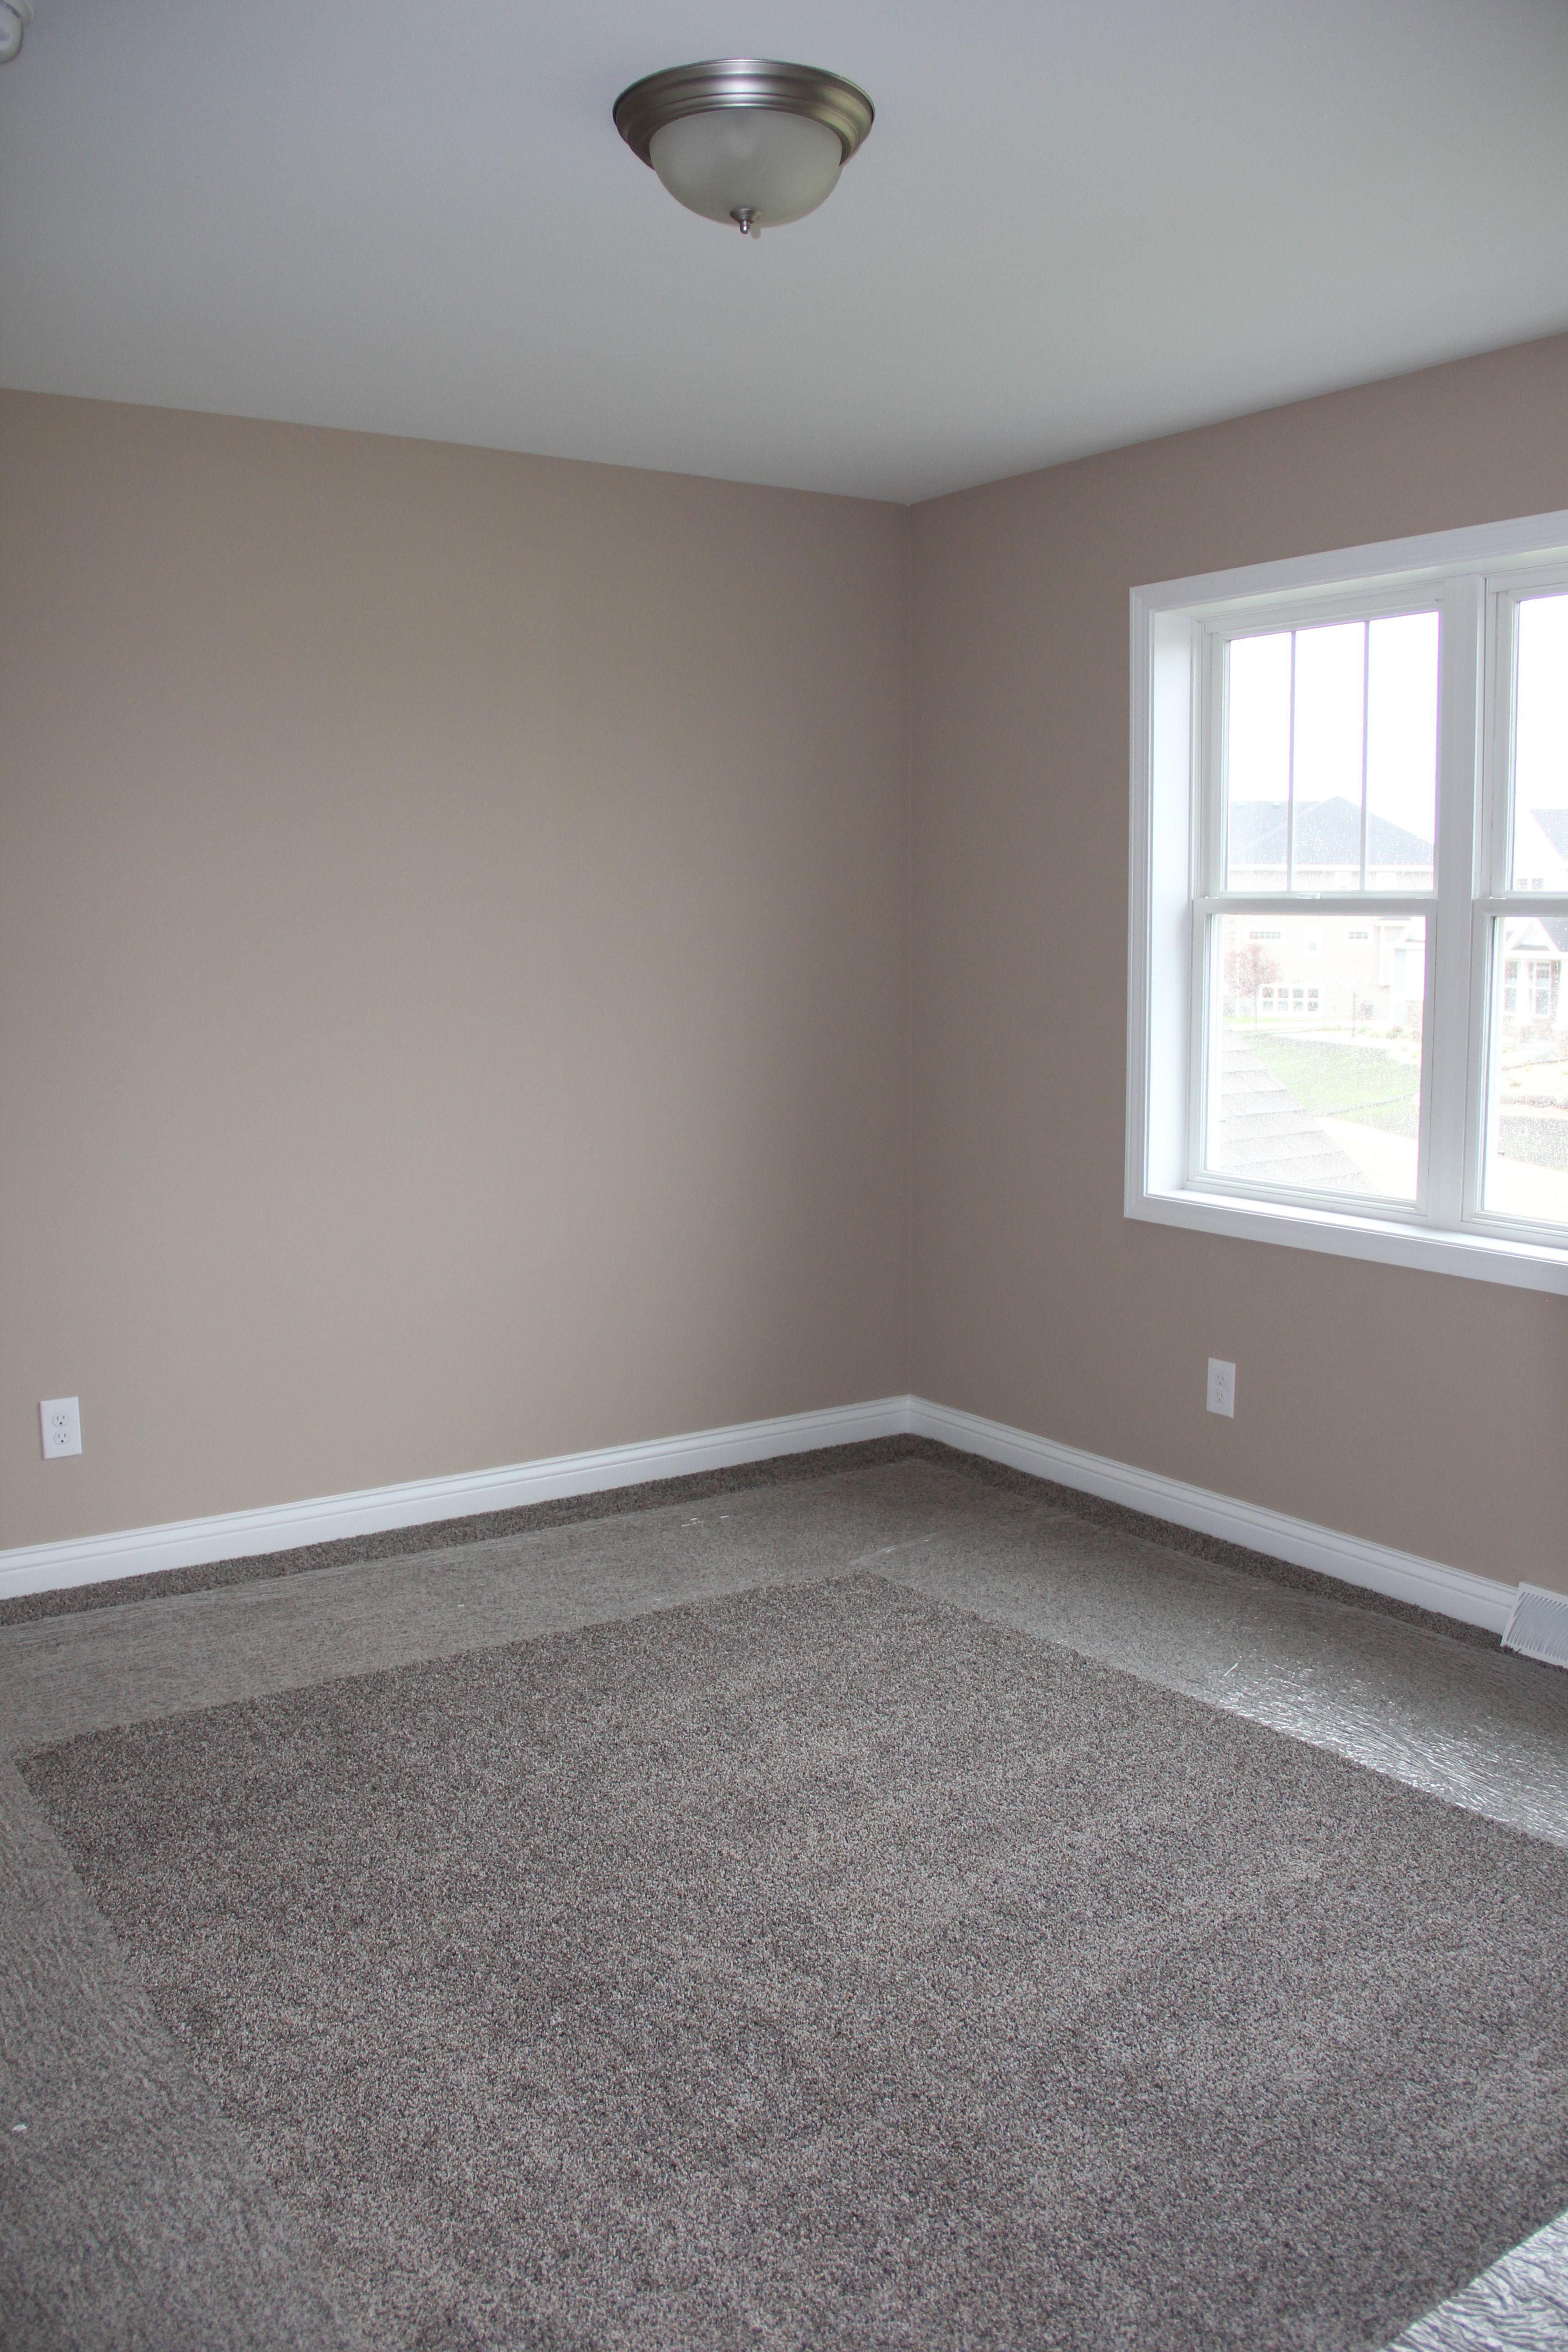 Spare Bedroom 6 15 15 Granny Pod Spare Bedroom Wall Carpet